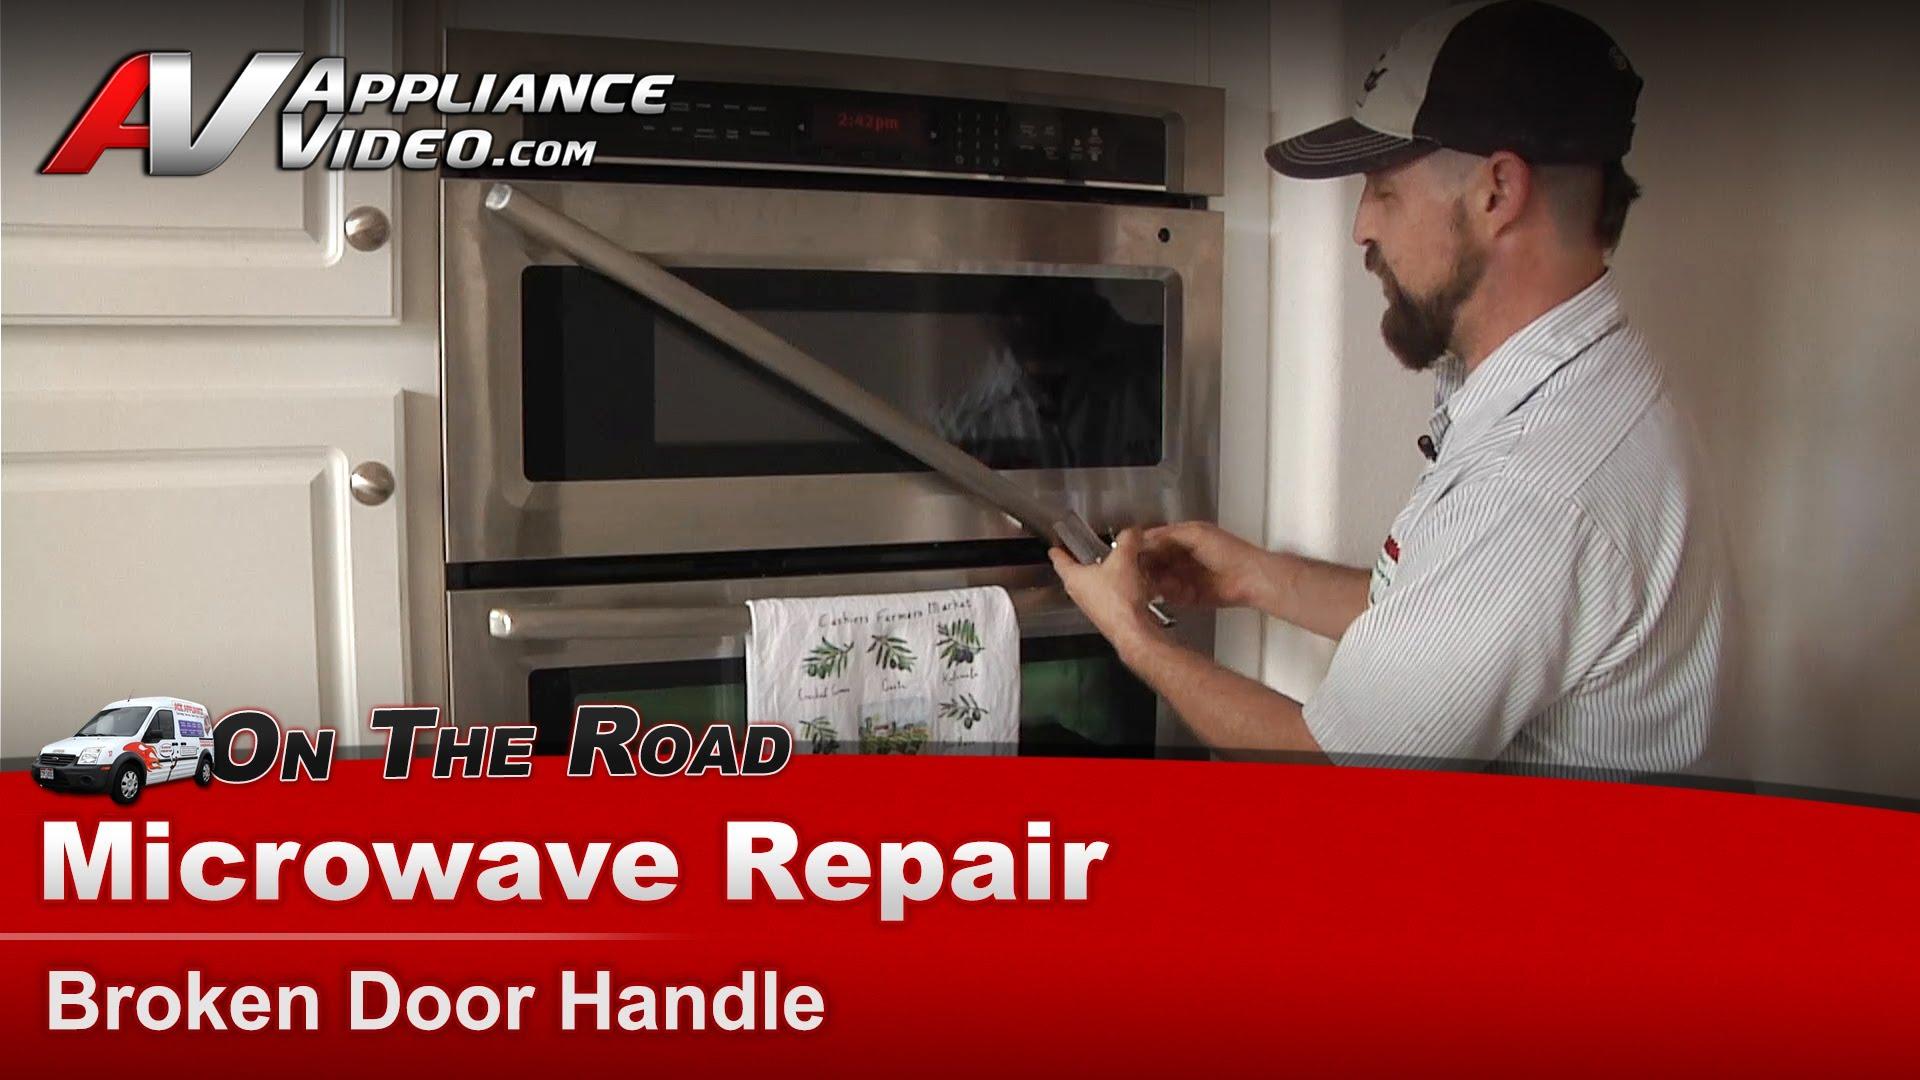 Whirlpool Mmw9730a500 Microwave Diagnostic And Repair Broken Door Handle Liance Video